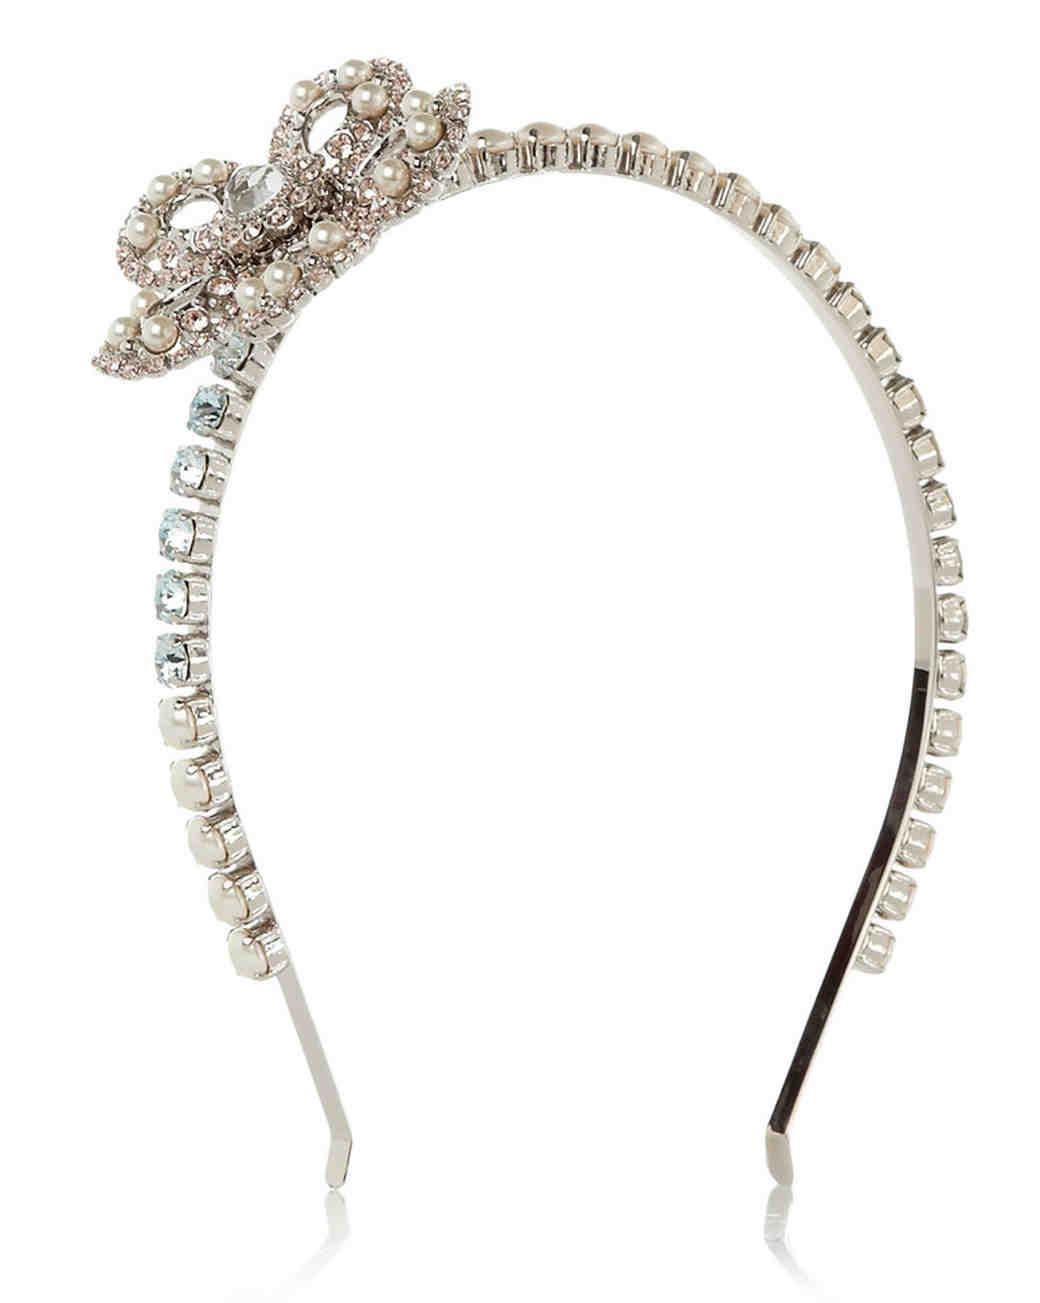 hair-accessories-miu-miu-headband-1014.jpg